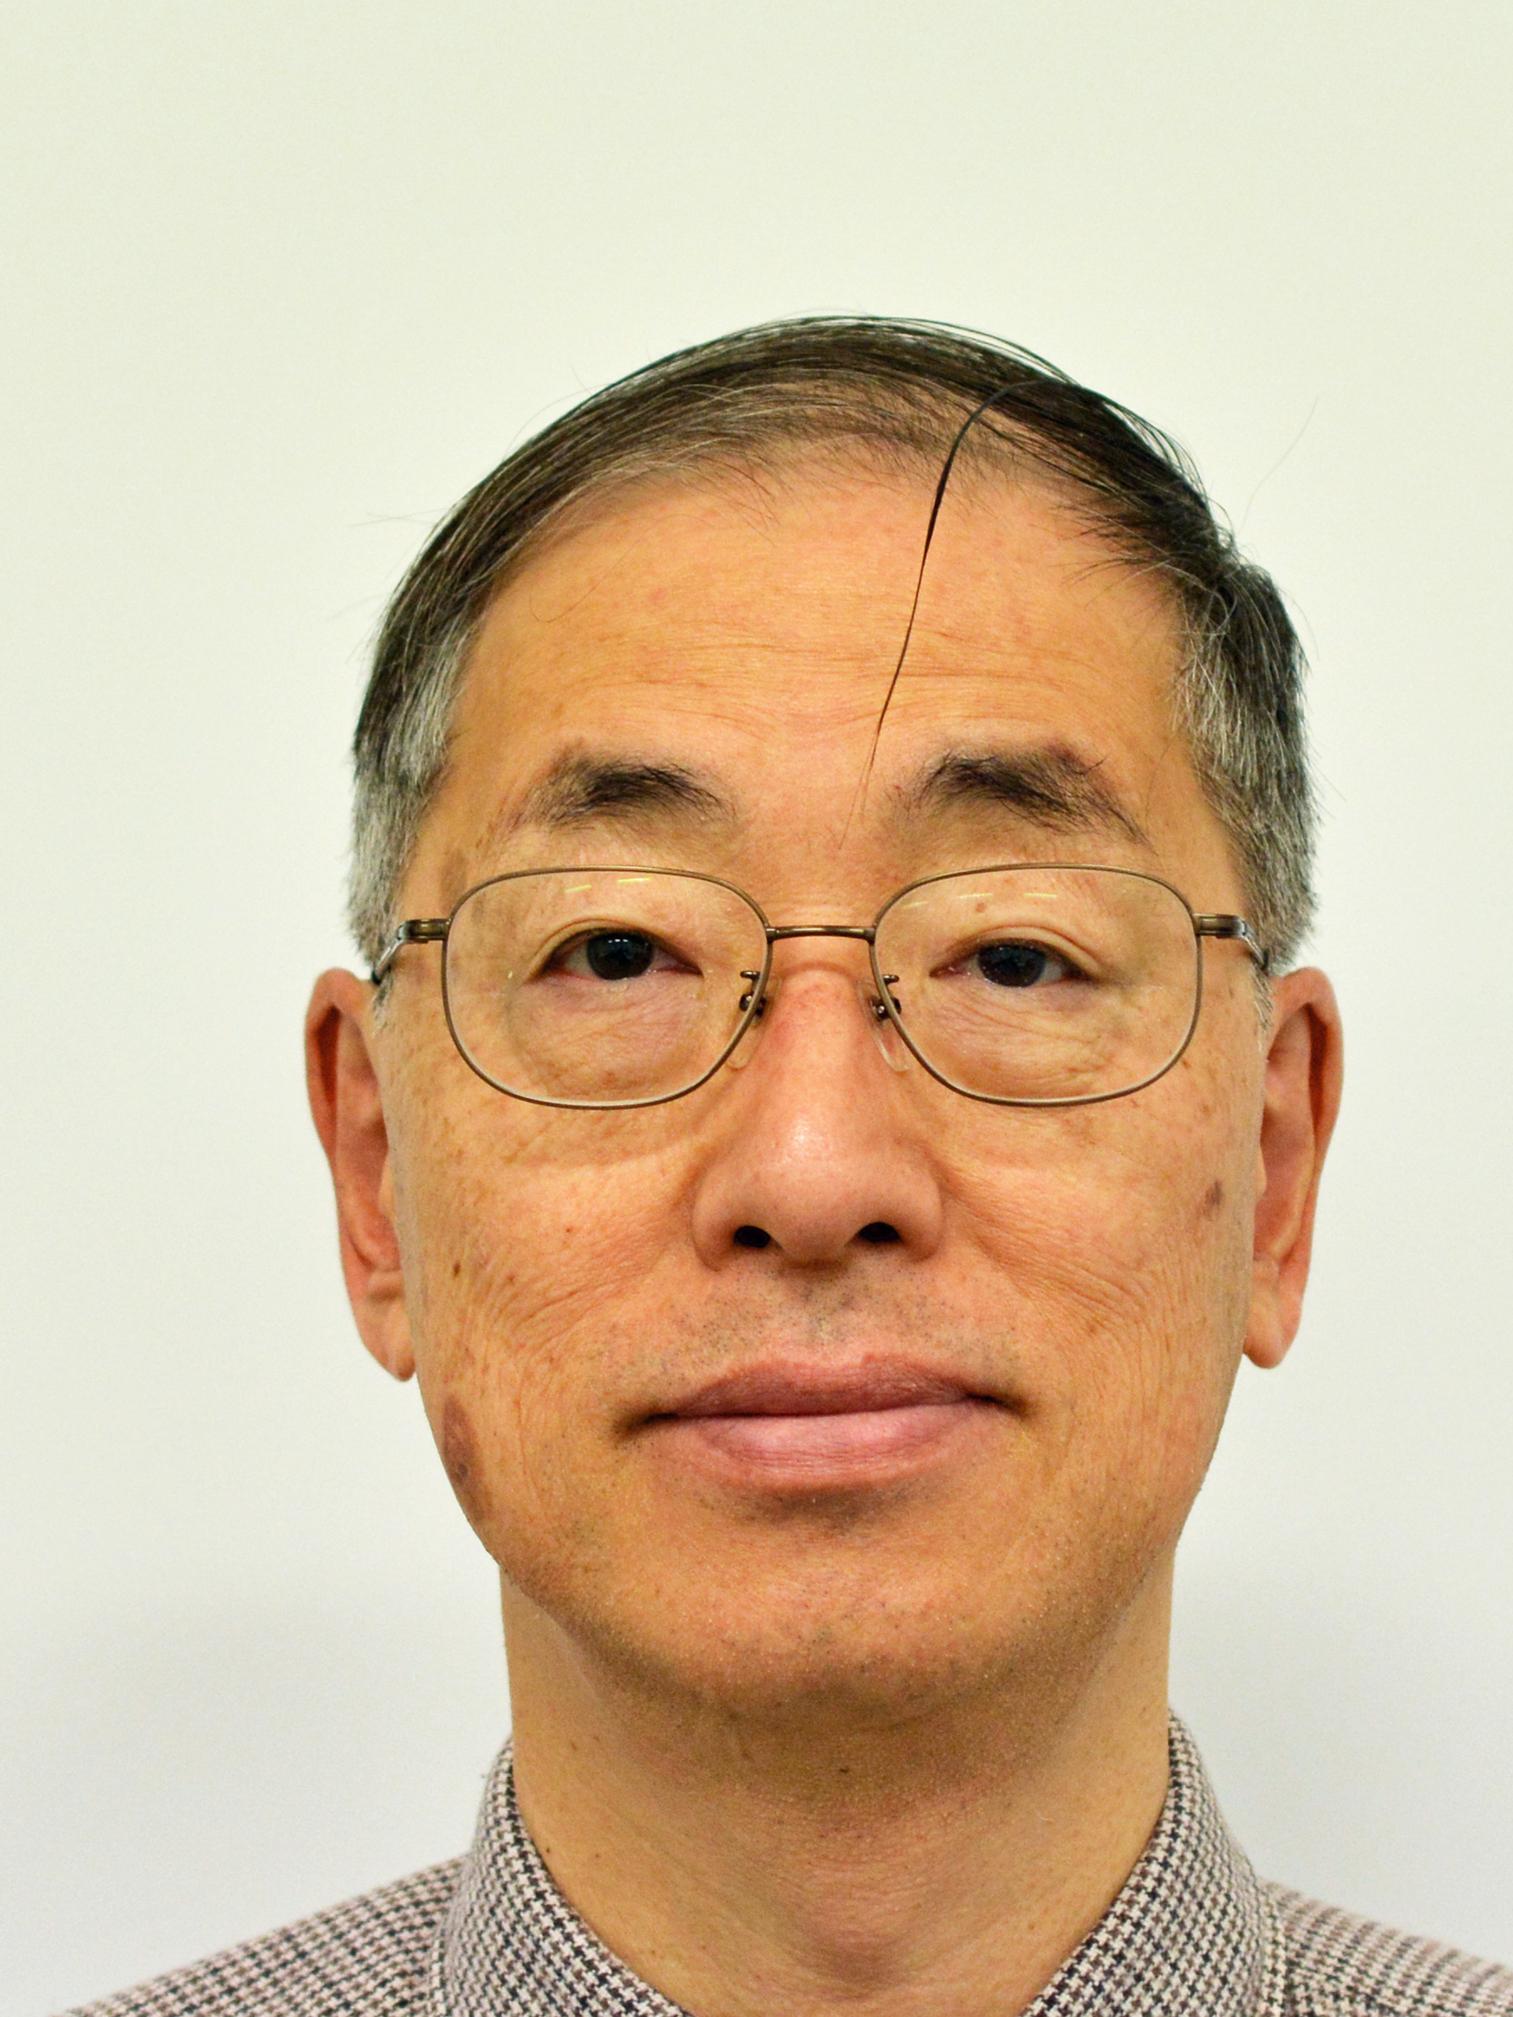 Mr. YASUHI UMEDA